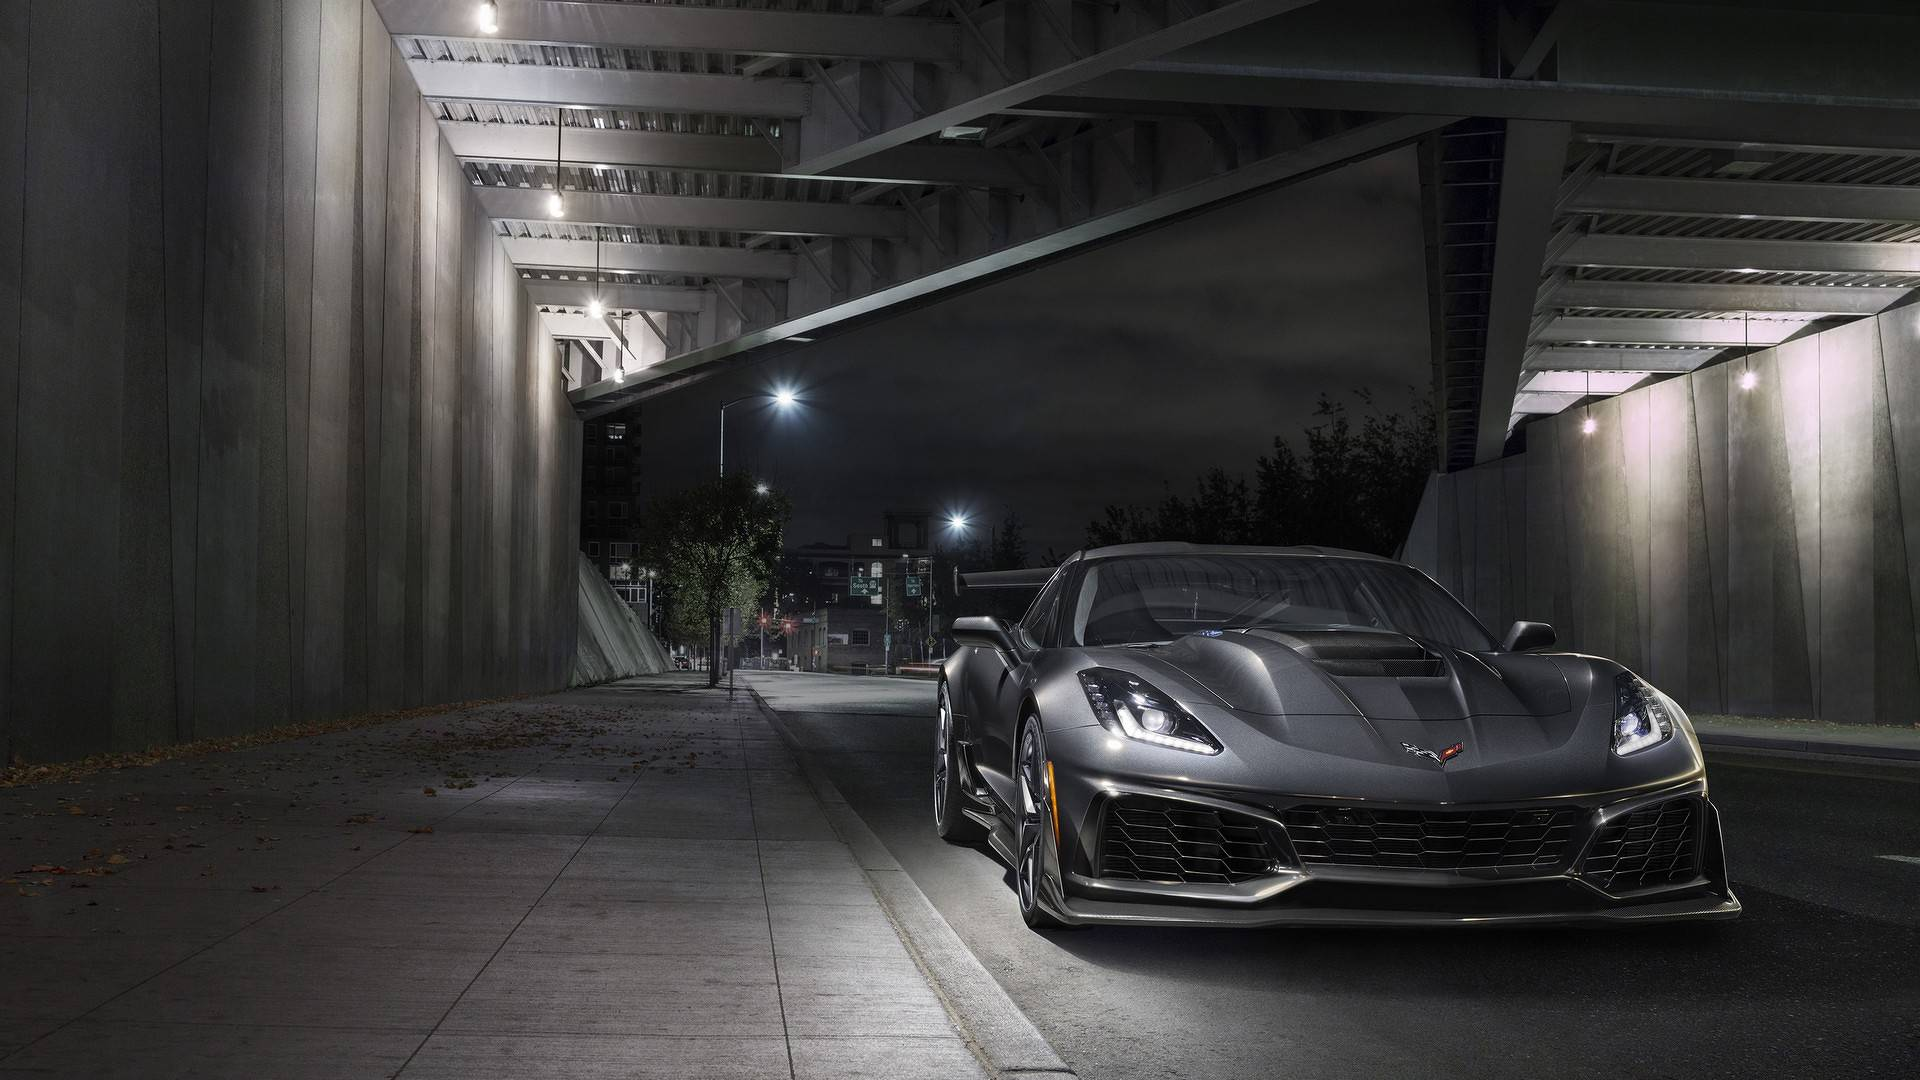 5a64499fbadb4 2019 chevy corvette zr1 شورولت کوروت ZR1 مدل ۲۰۱۹ رونمای شد   اجاره ماشین